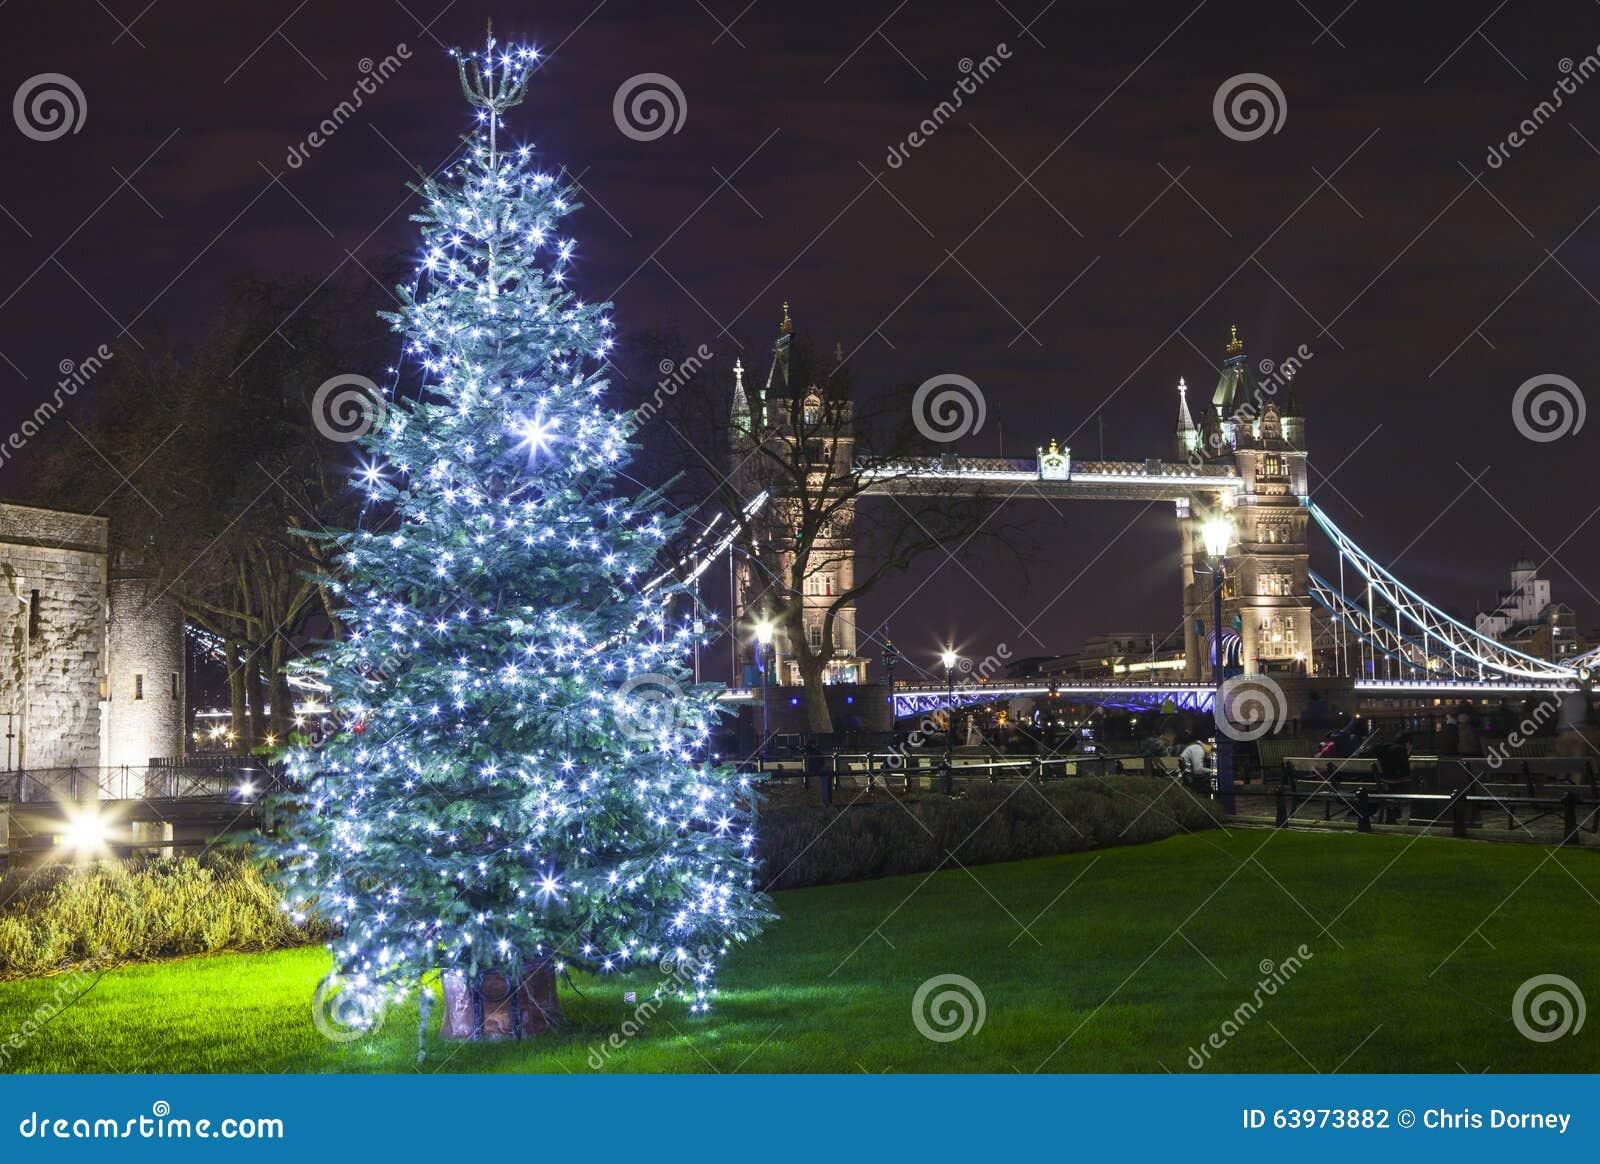 Tower Bridge At Christmas Stock Photo - Image: 63973882